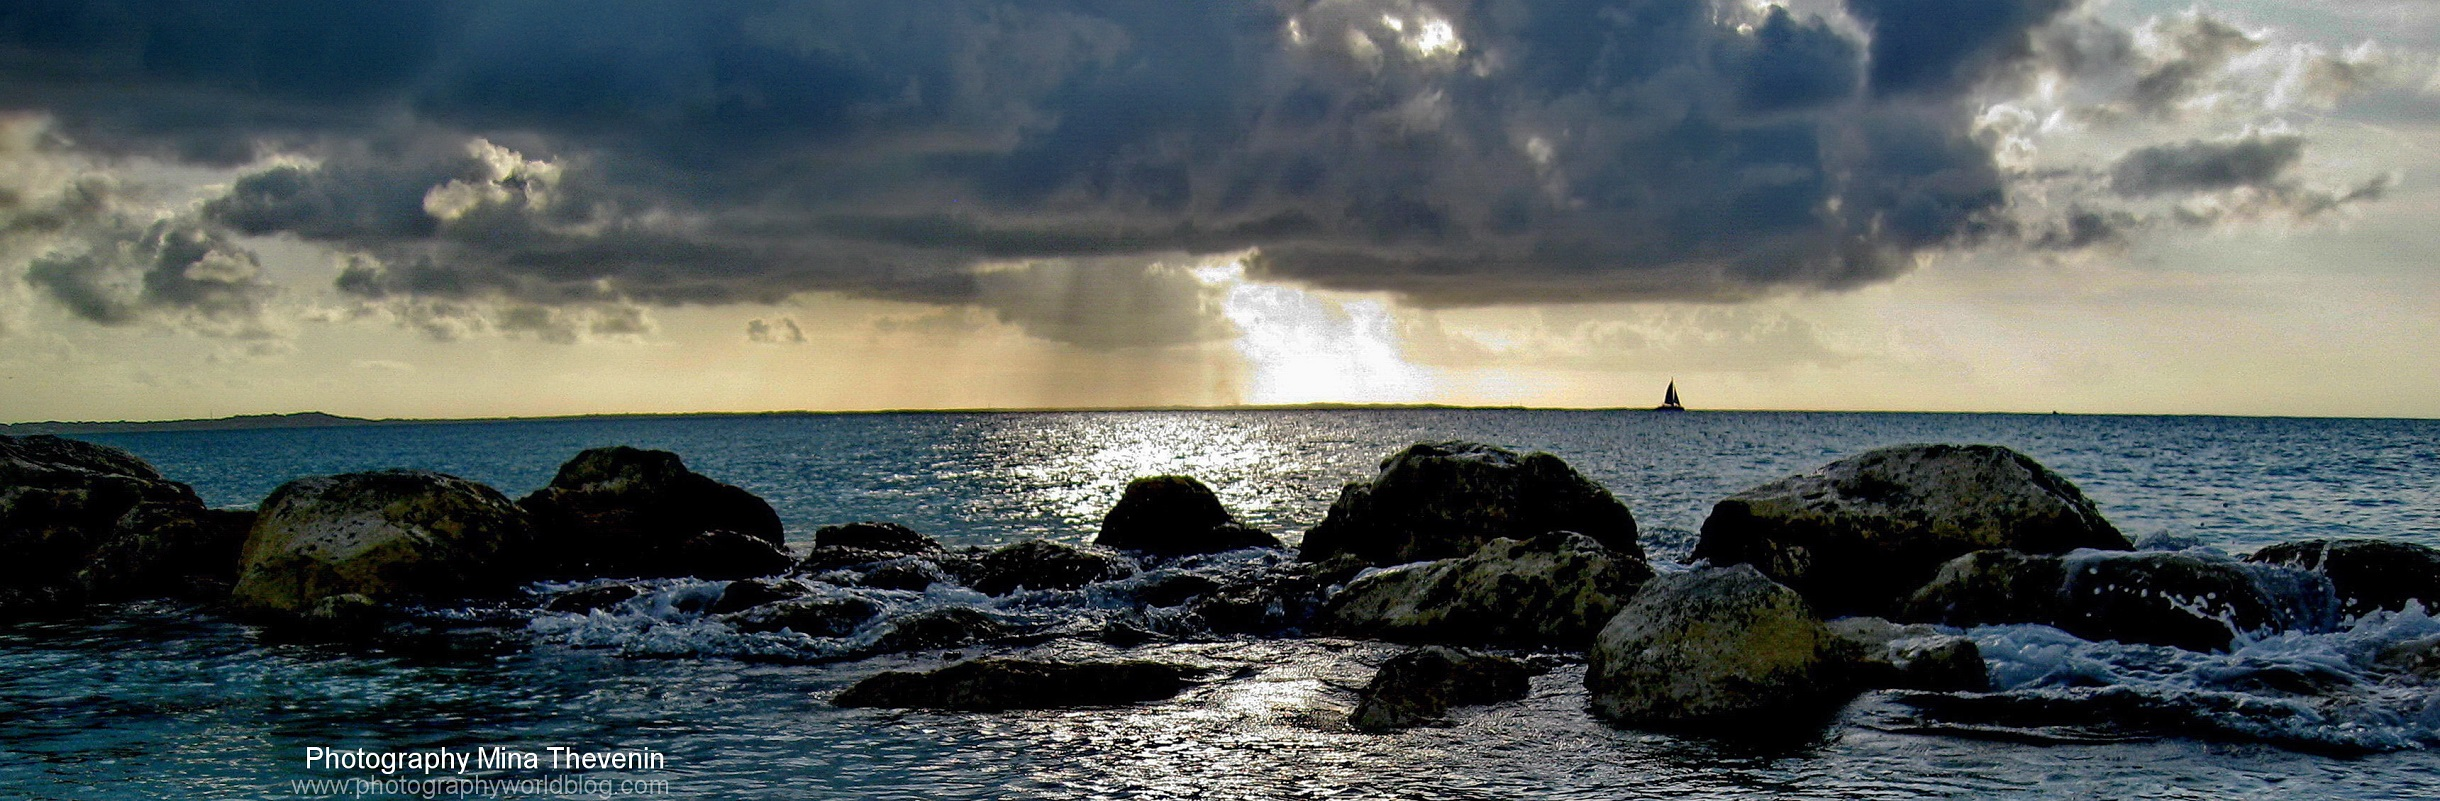 Curaçao Island sunset in the Caribbean. Photograph by Mina Thevenin. Photography World. www.photographyworld.org